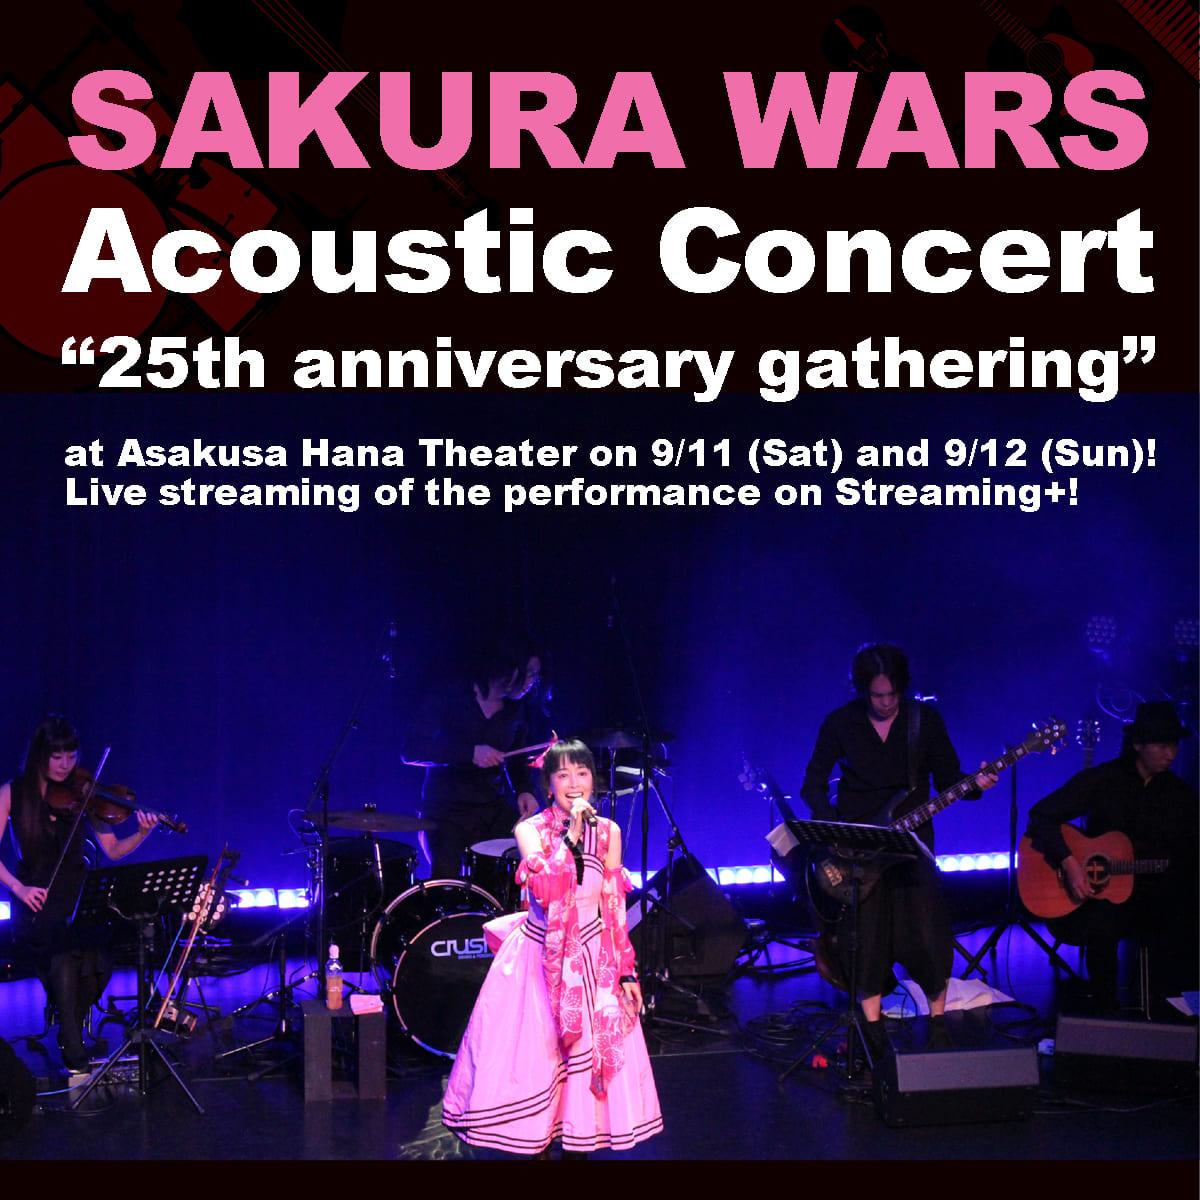 [Streaming+] SAKURA WARS acoustic concert 25th anniversary gathering